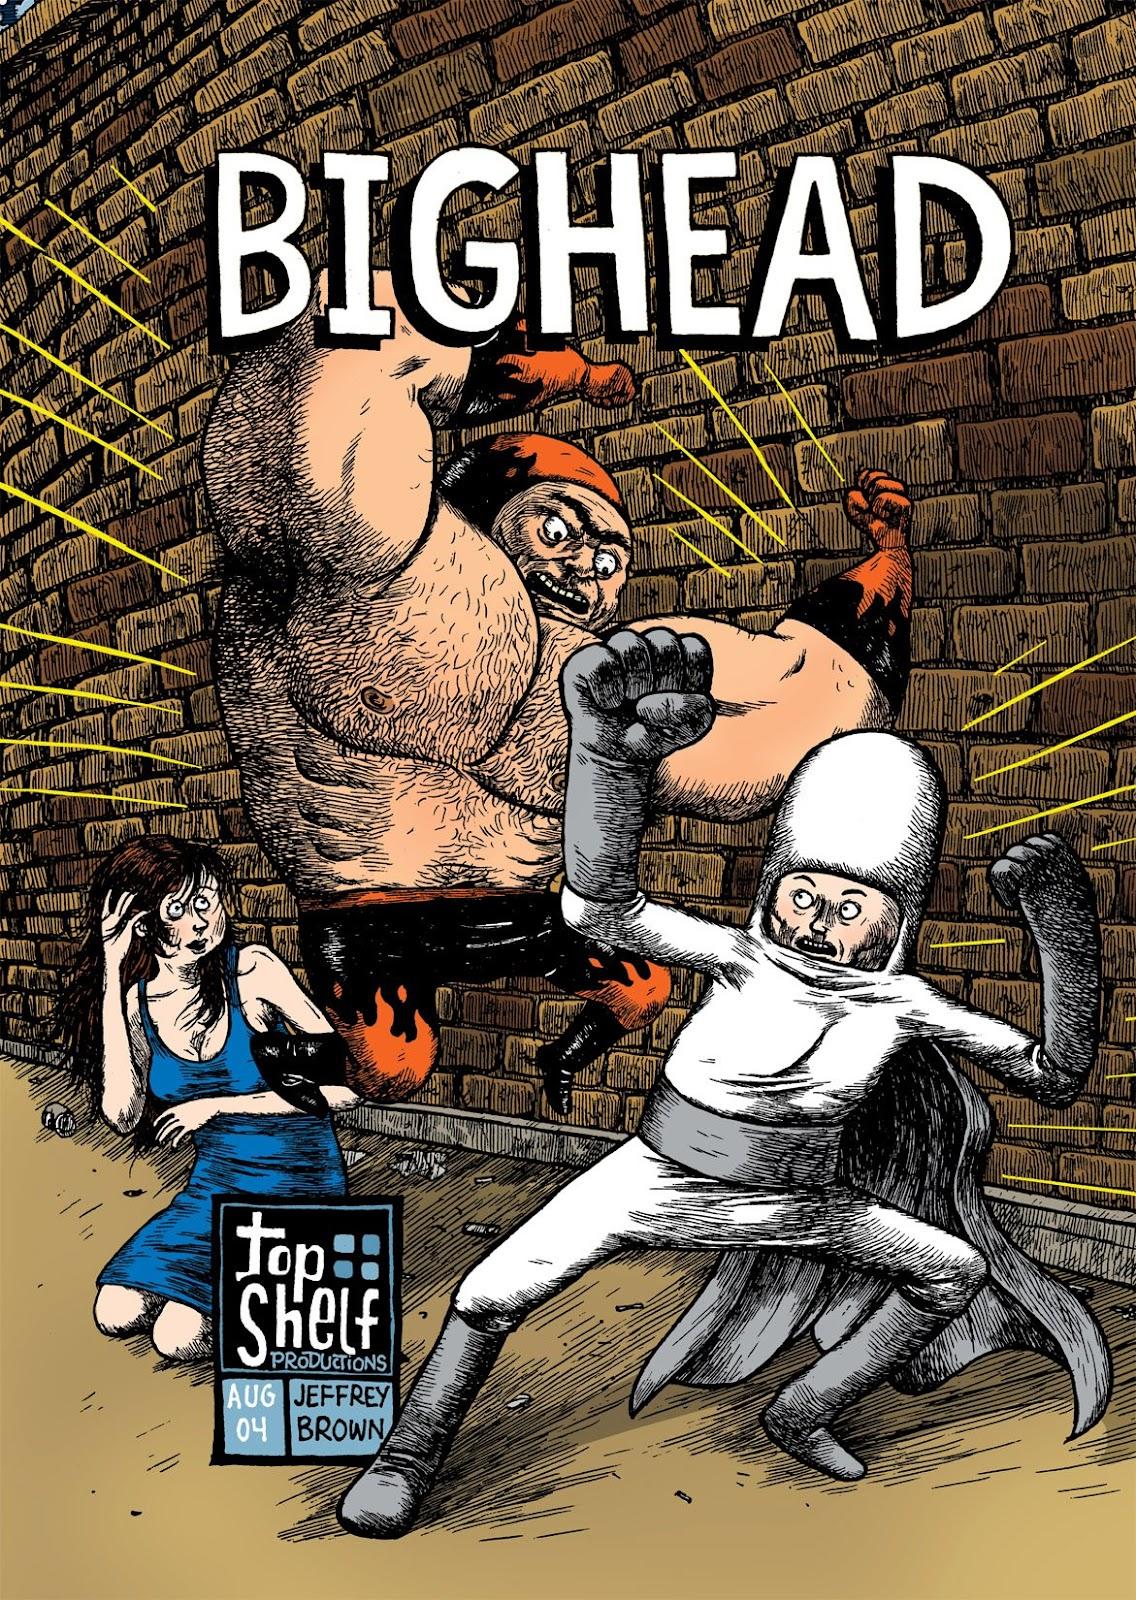 Bighead TPB Page 1